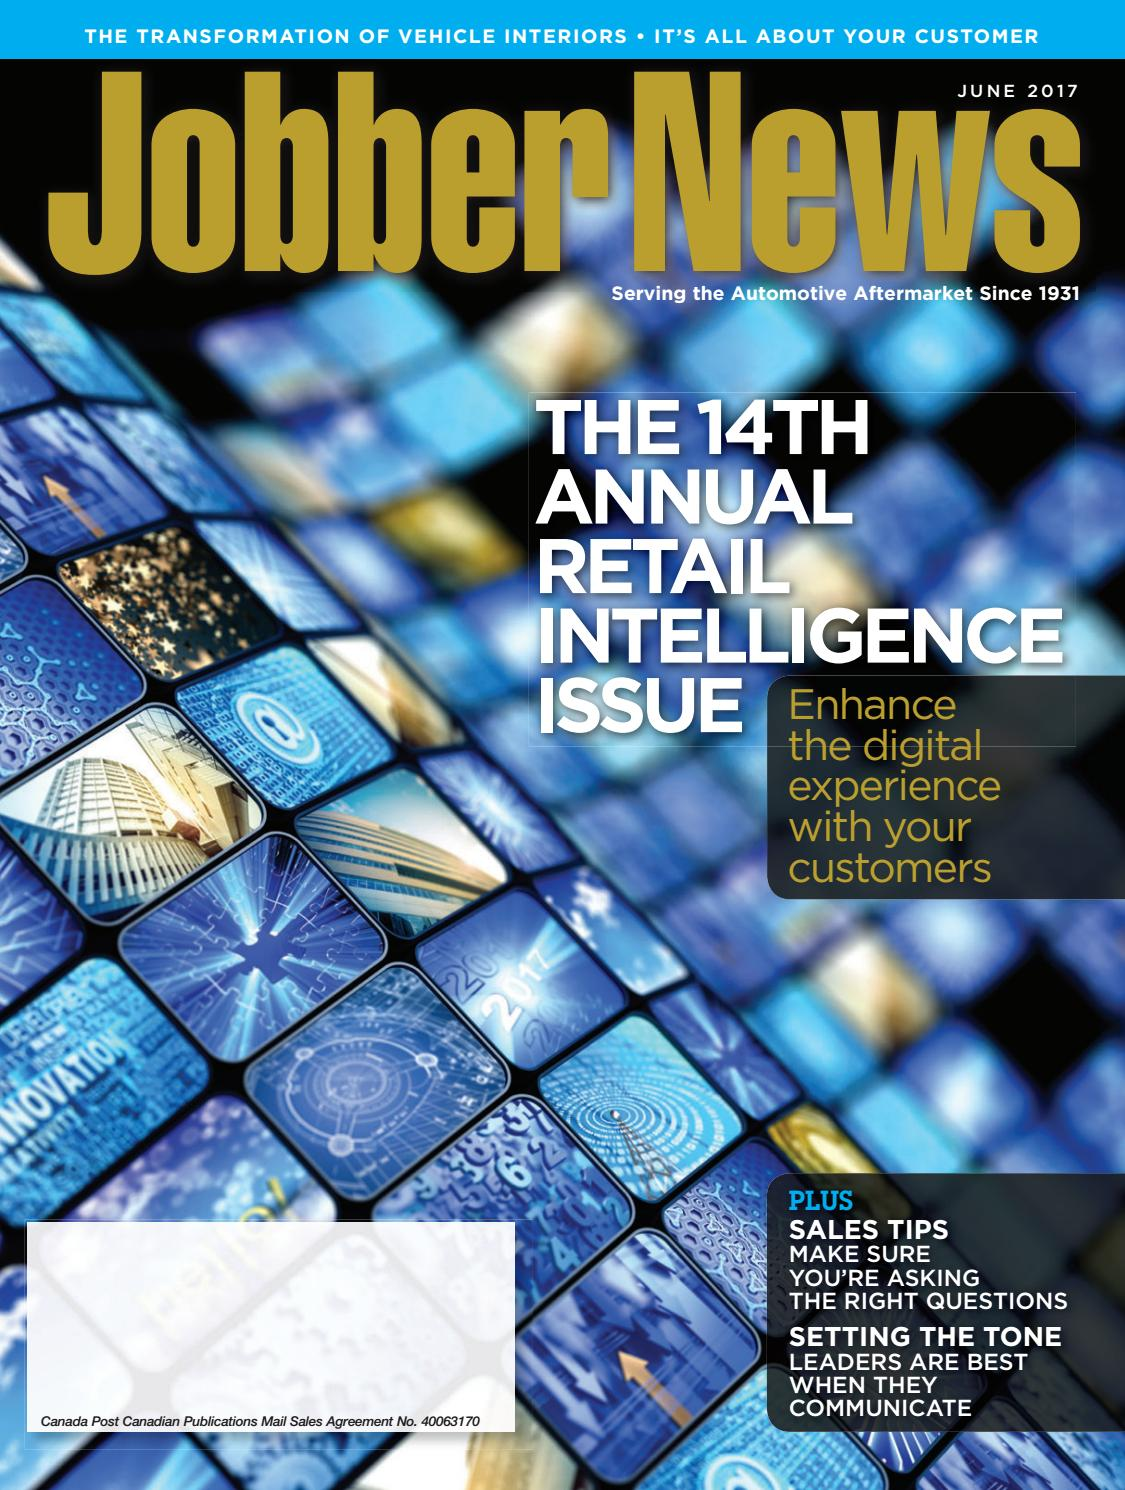 Jobber News June 2017 by Annex-Newcom LP - issuu